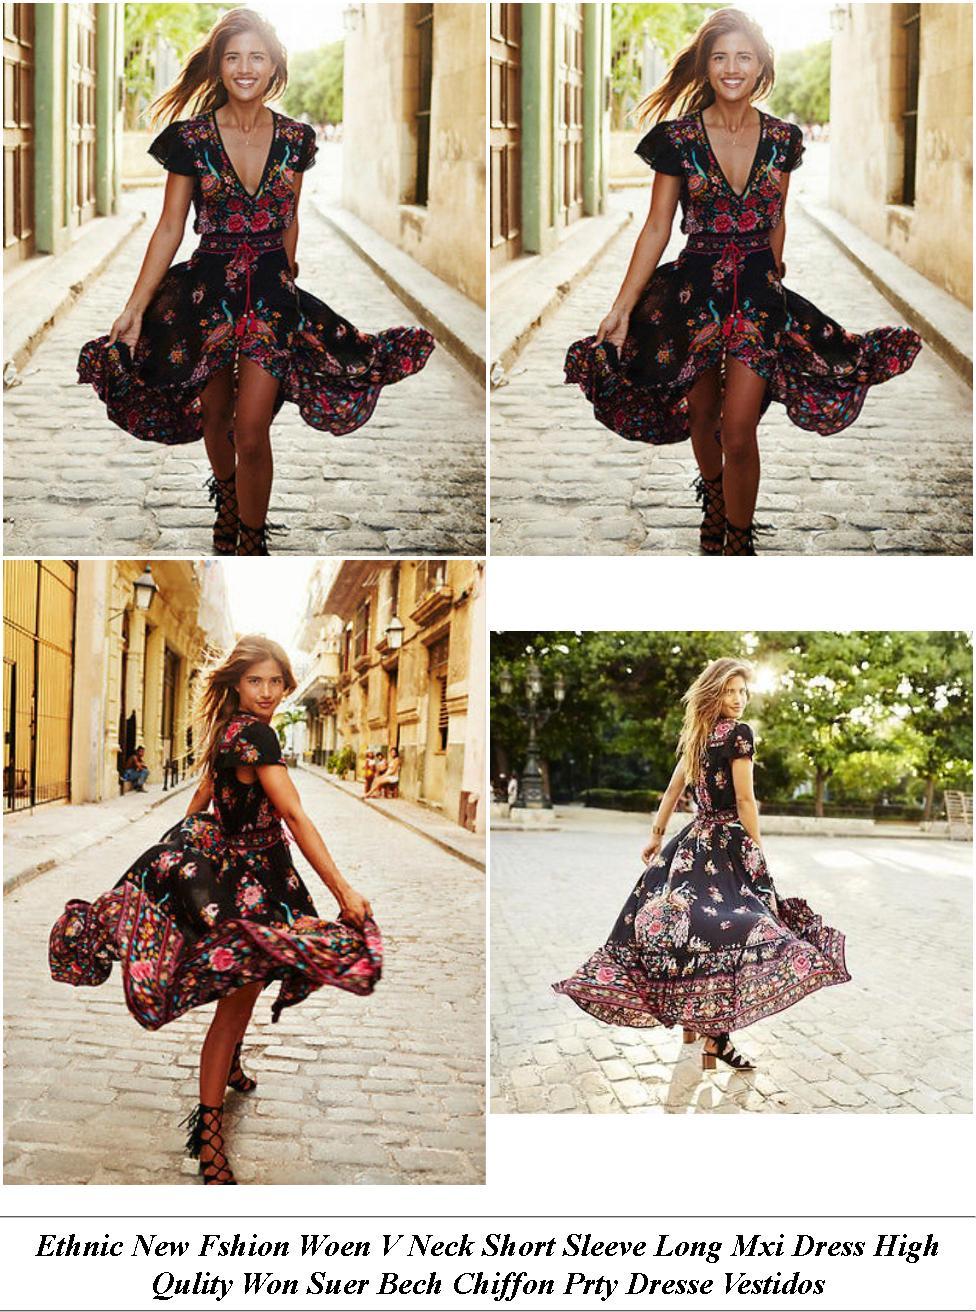 Lack Wedding Dress Canada - For Sale Shop - Satin Maxi Dress Uk